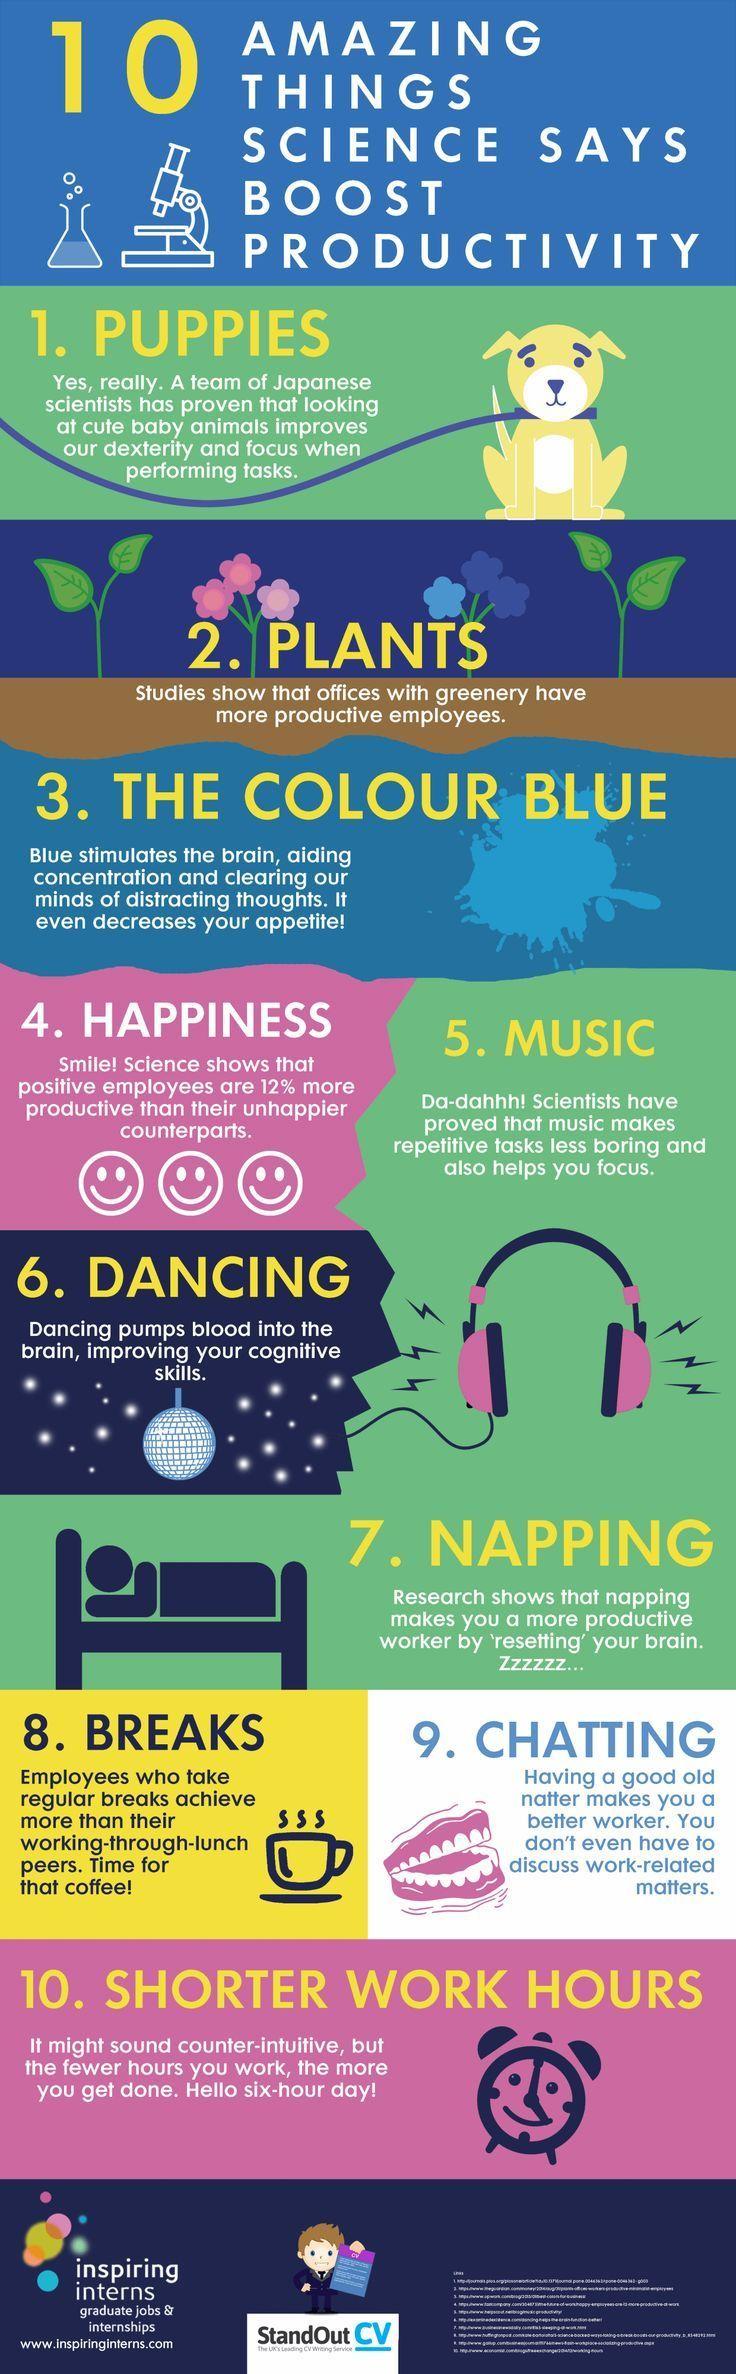 Ten Scientifically Proven Productivity Tips